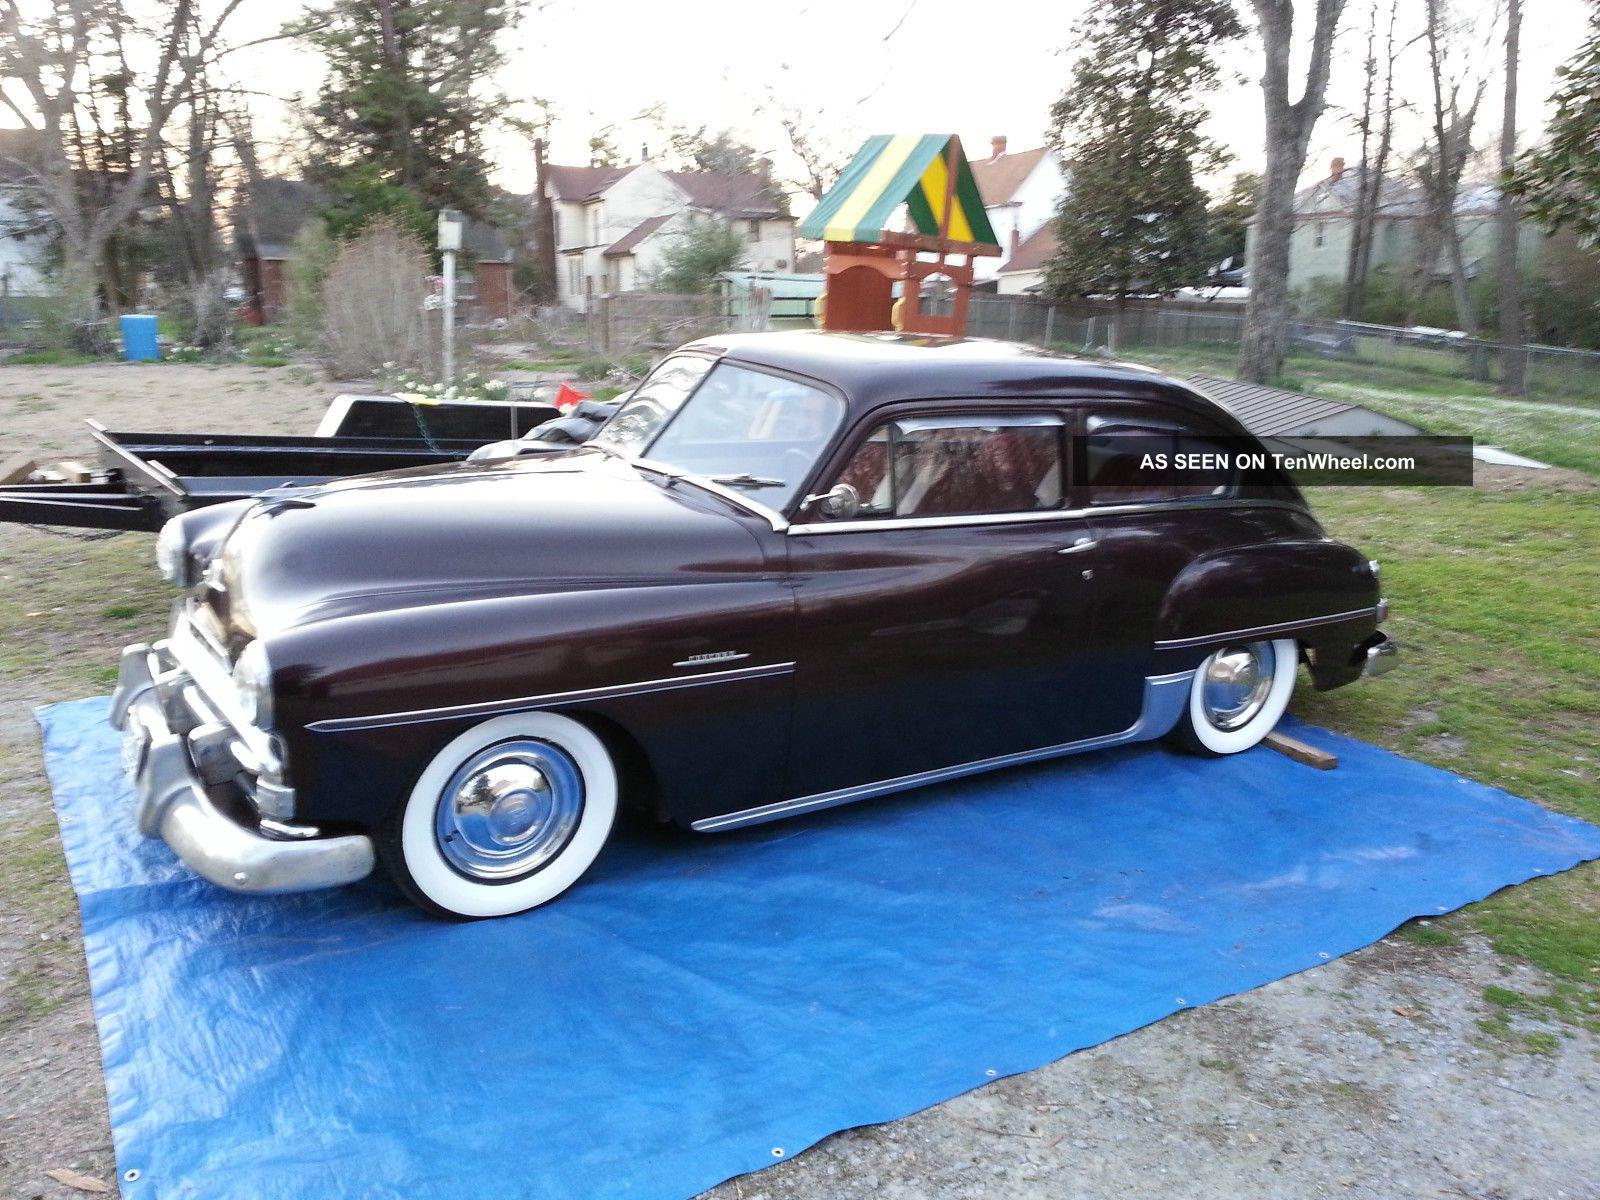 1951 Plymouth Concord Ratrod Rat Rod Hotrod Hot Lowrider Classic Old Chevrolet Custom